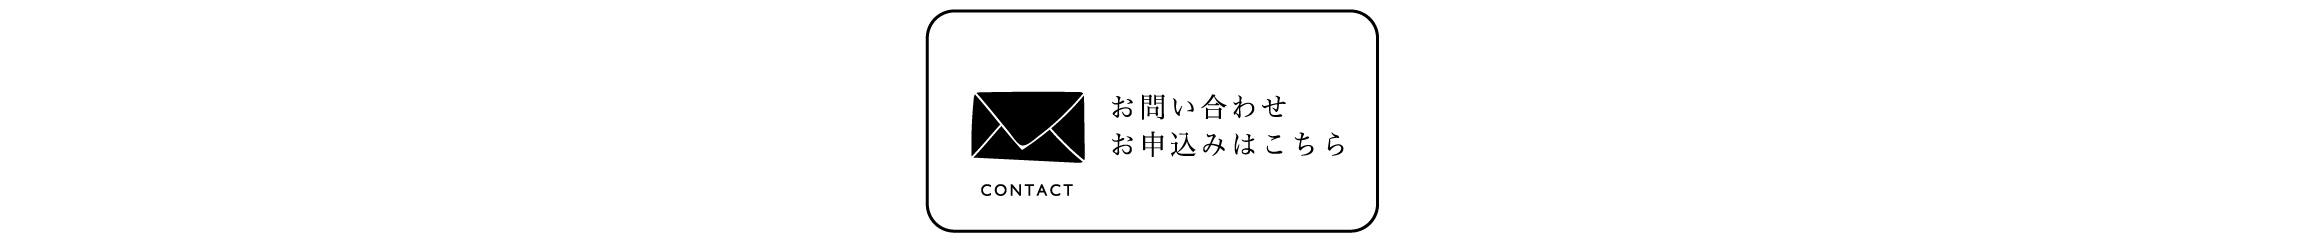 contact長